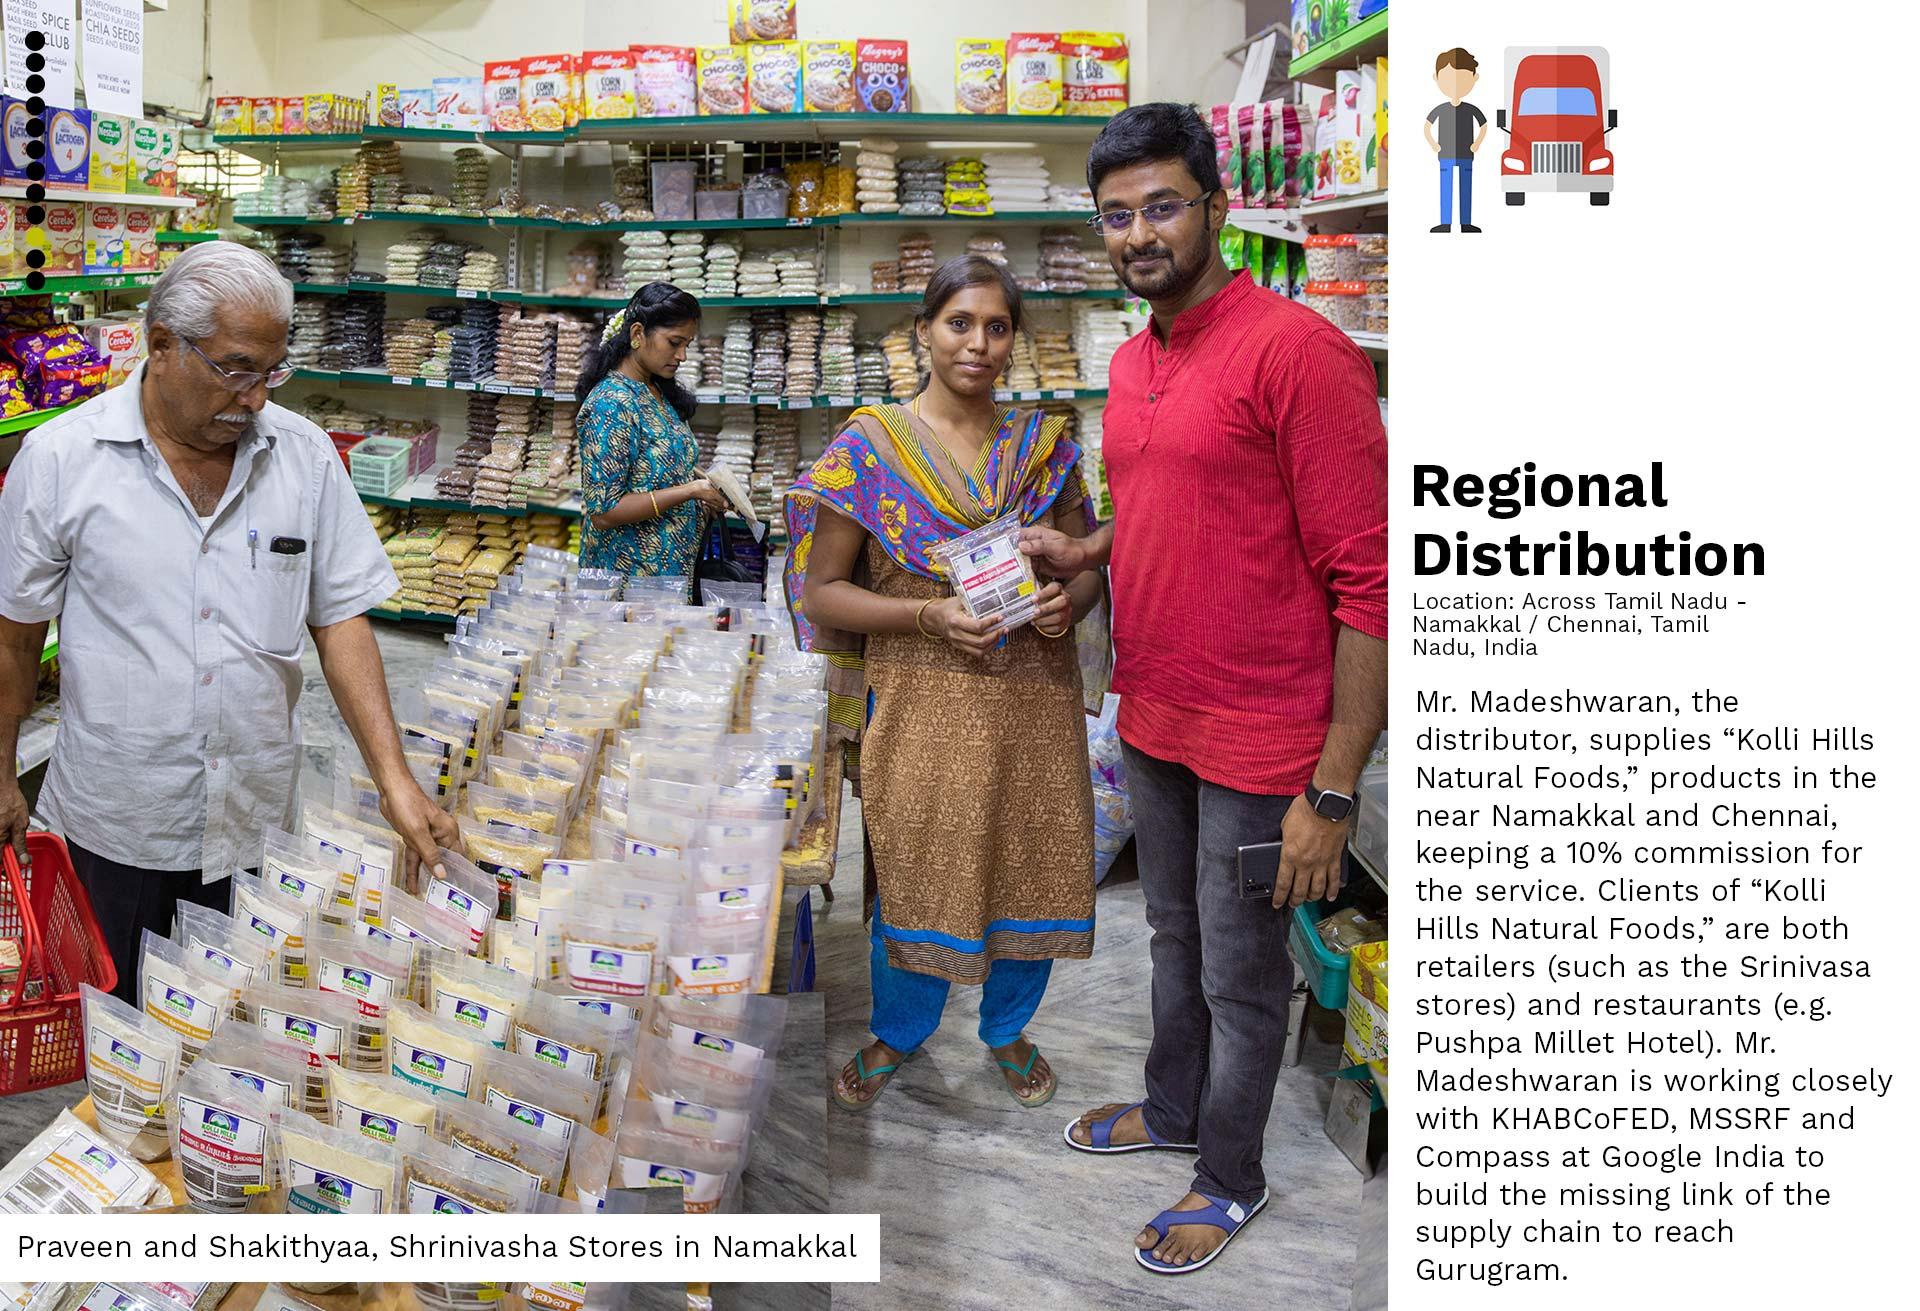 10-Regional Distribution